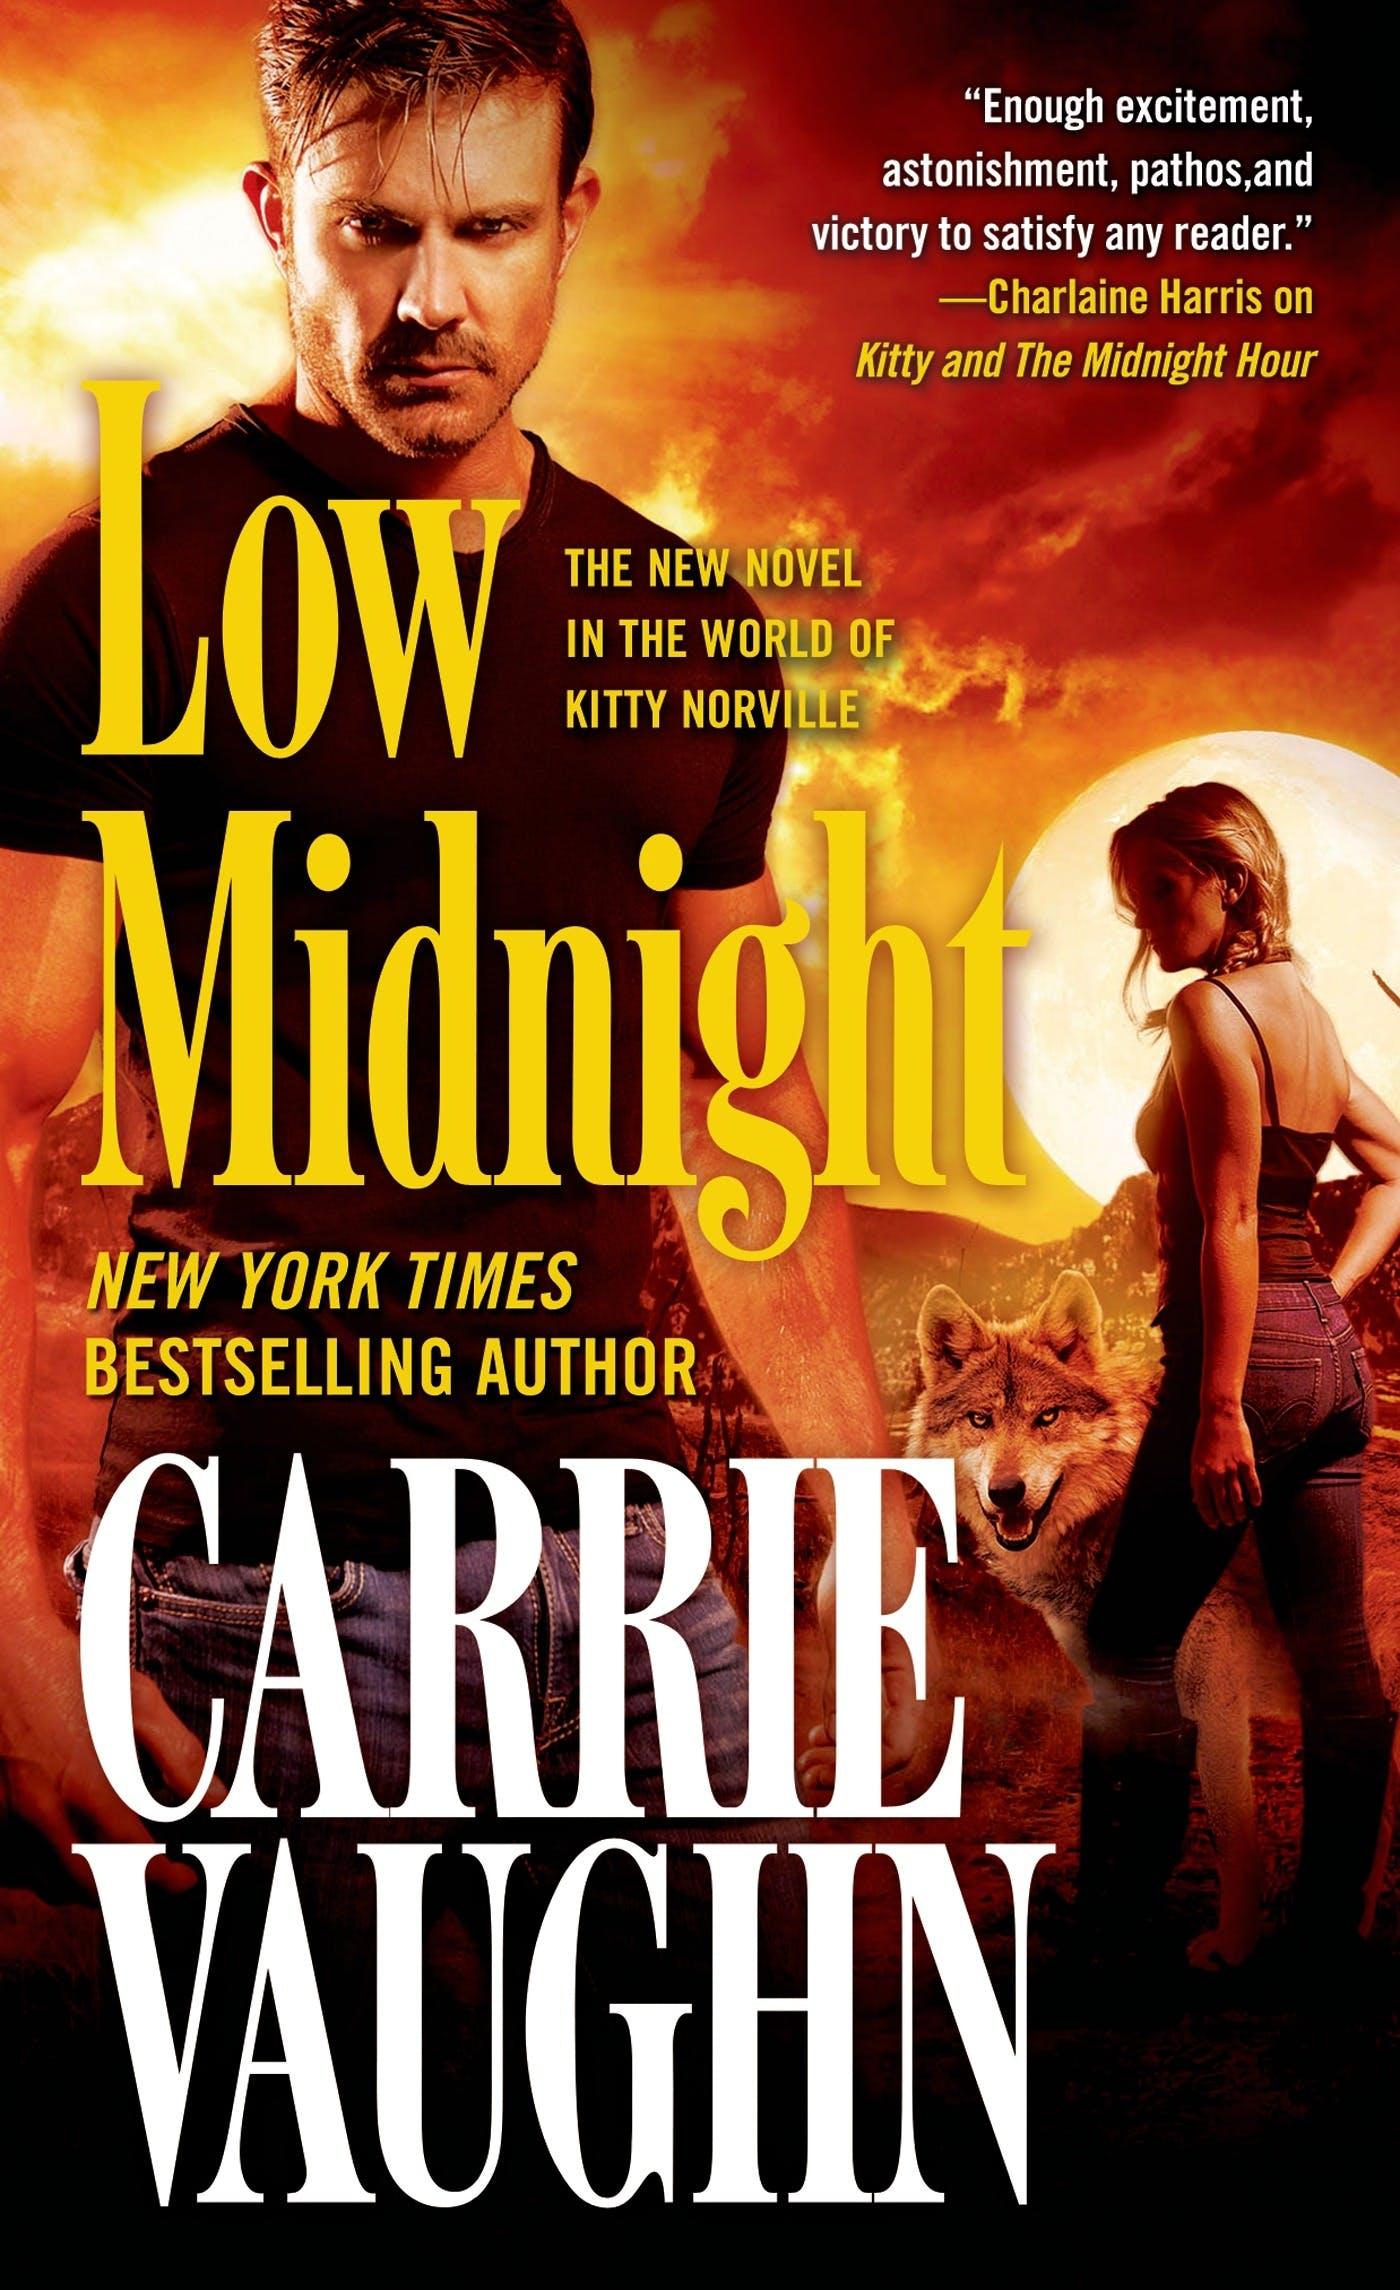 Image of Low Midnight